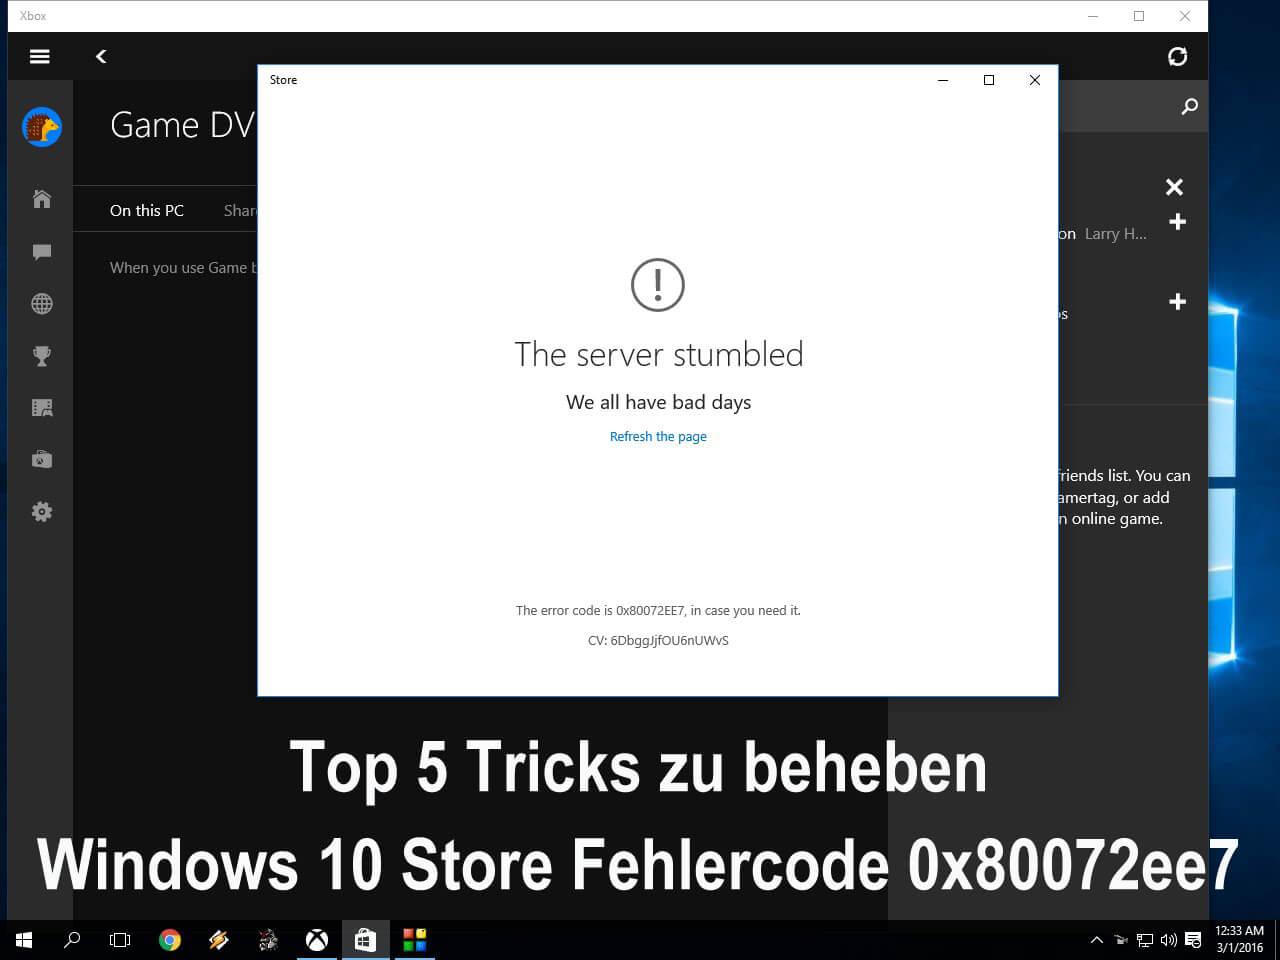 Fehlercode 0x80072ee7